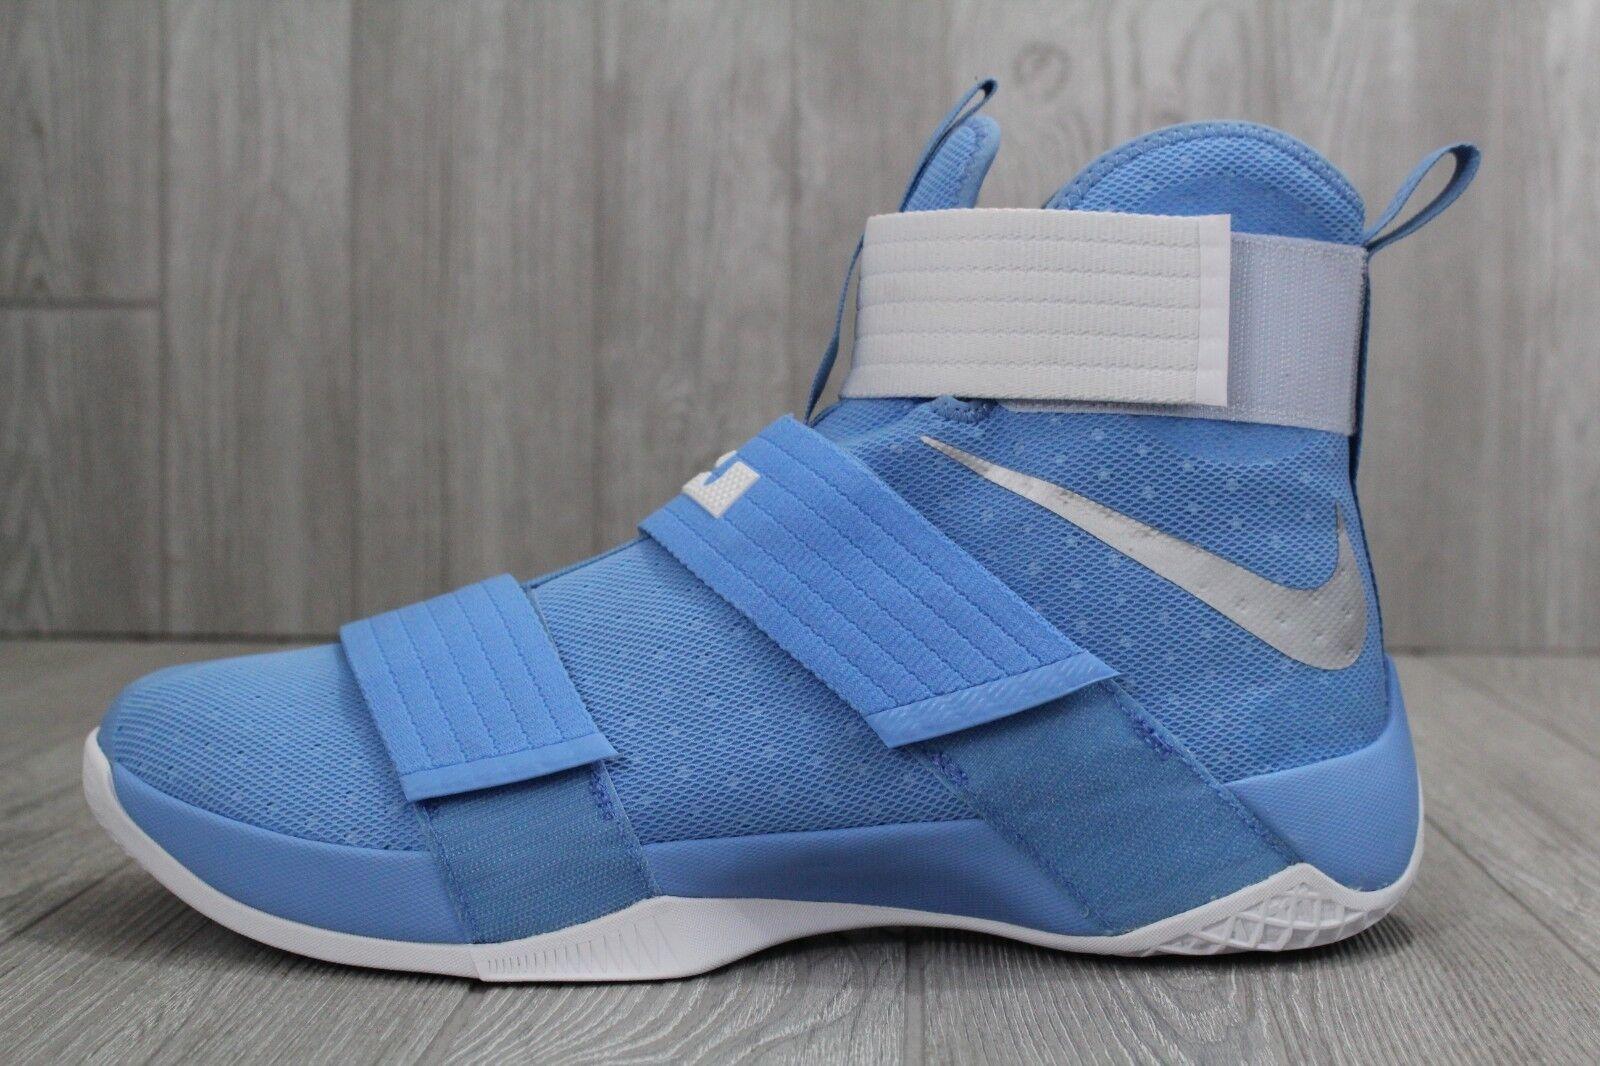 30 New Size 15.5 Nike Lebron LBJ Soldier 10 TB Promo University Blue 856489-443